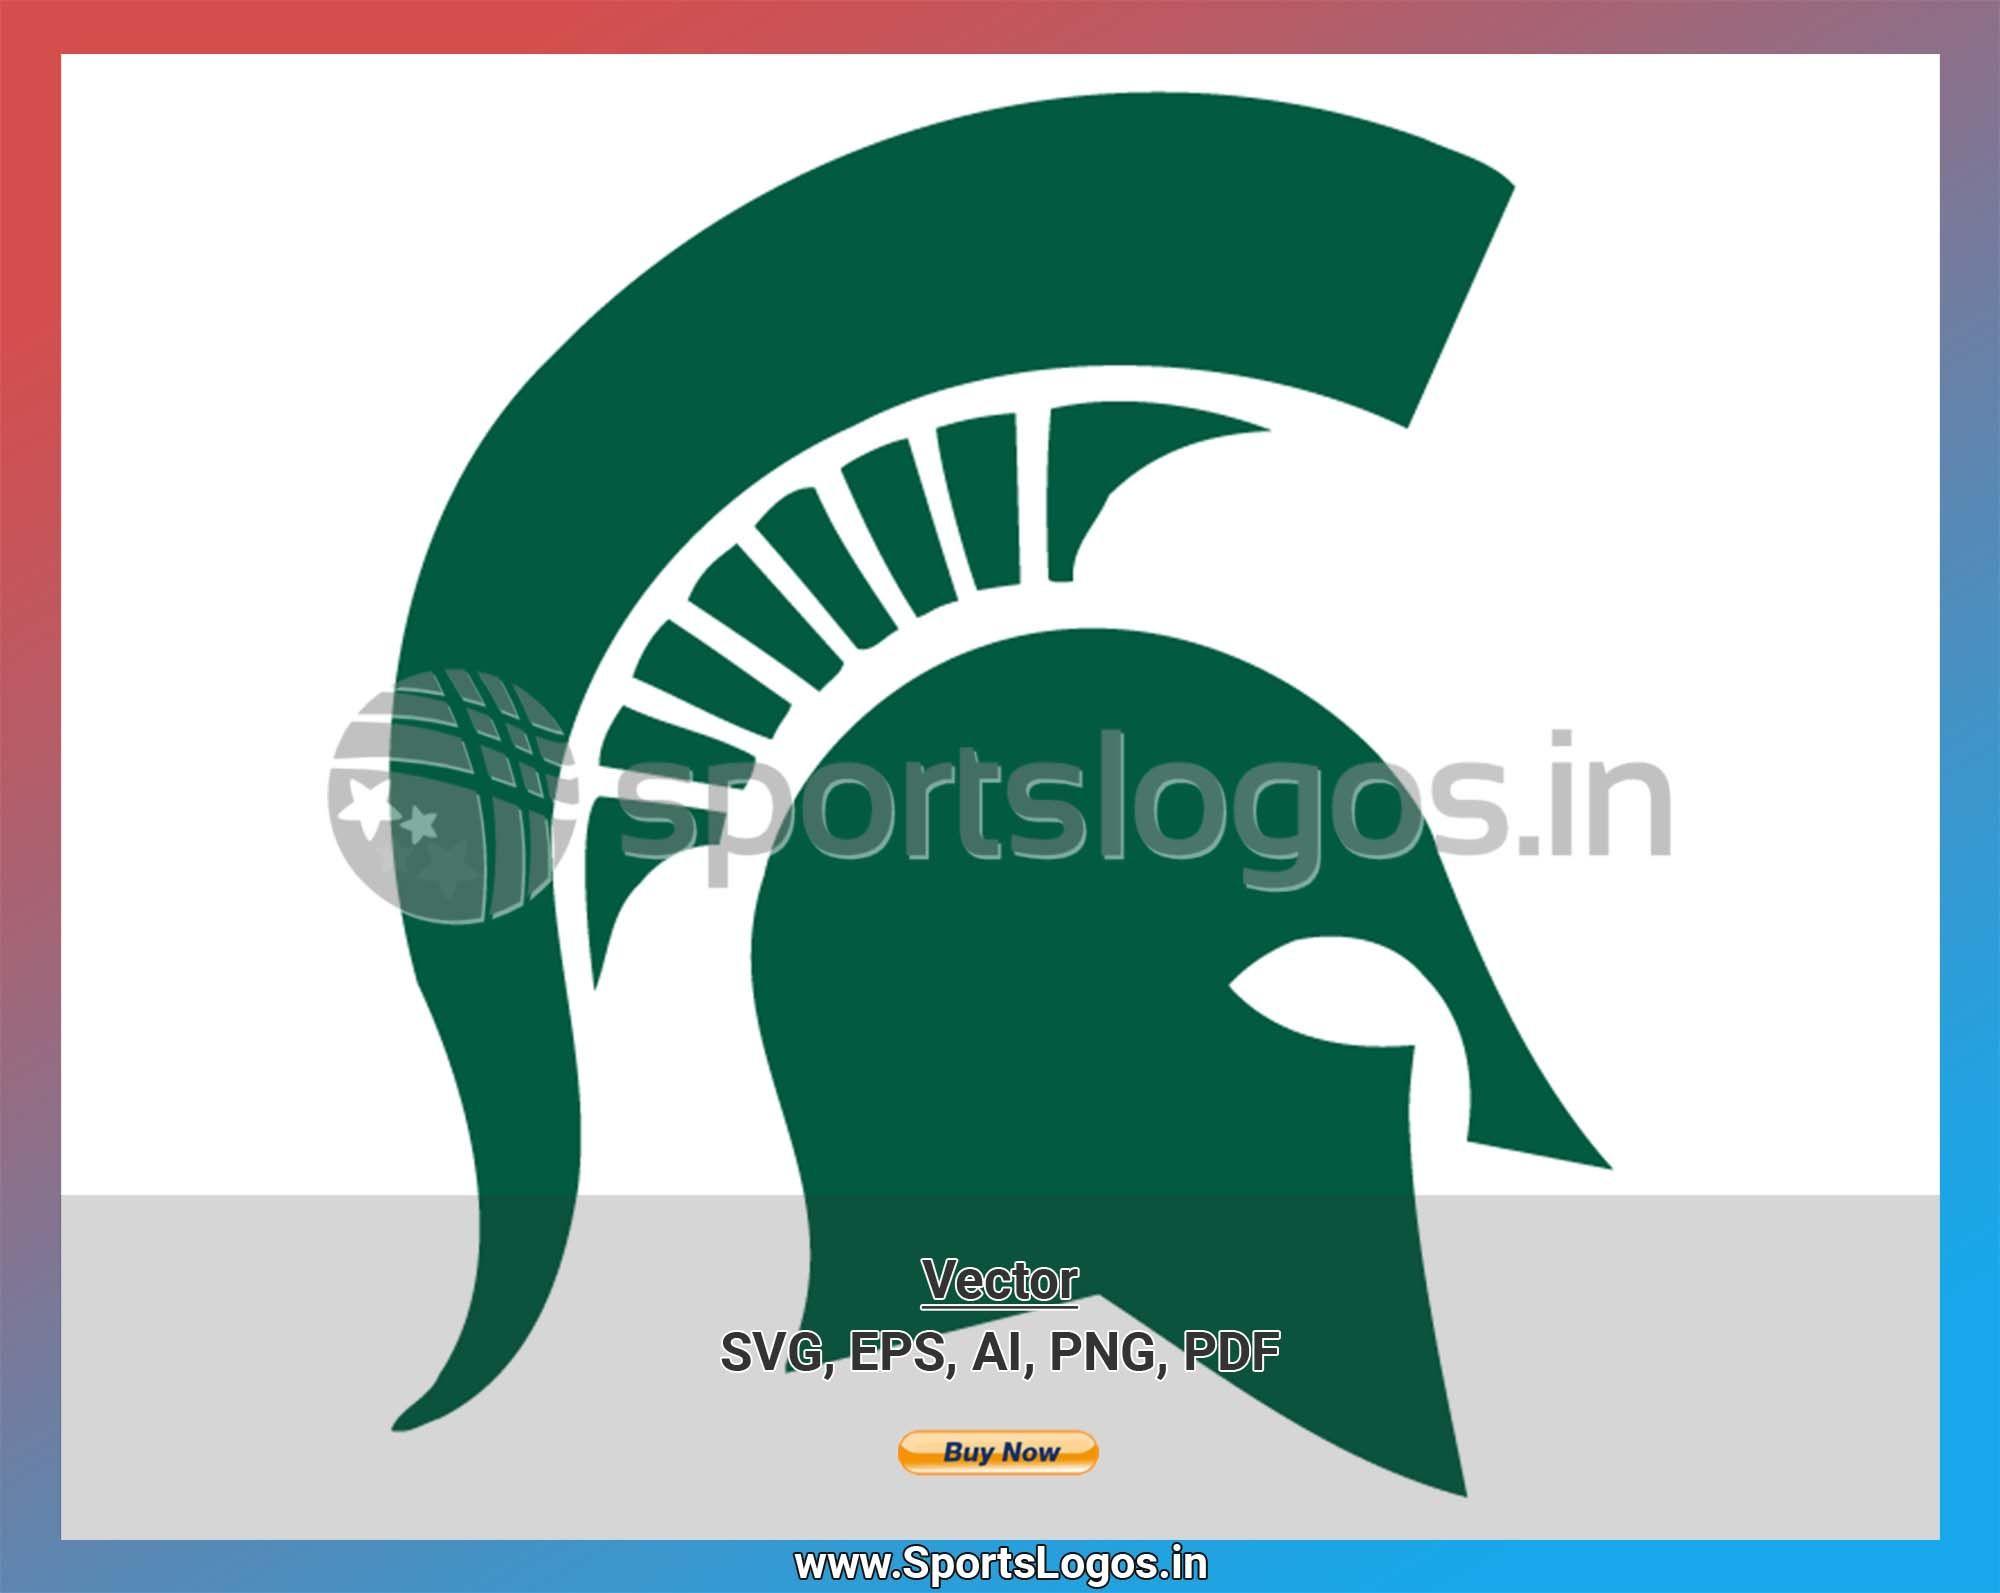 Michigan State Spartans 1977, NCAA Division I (im